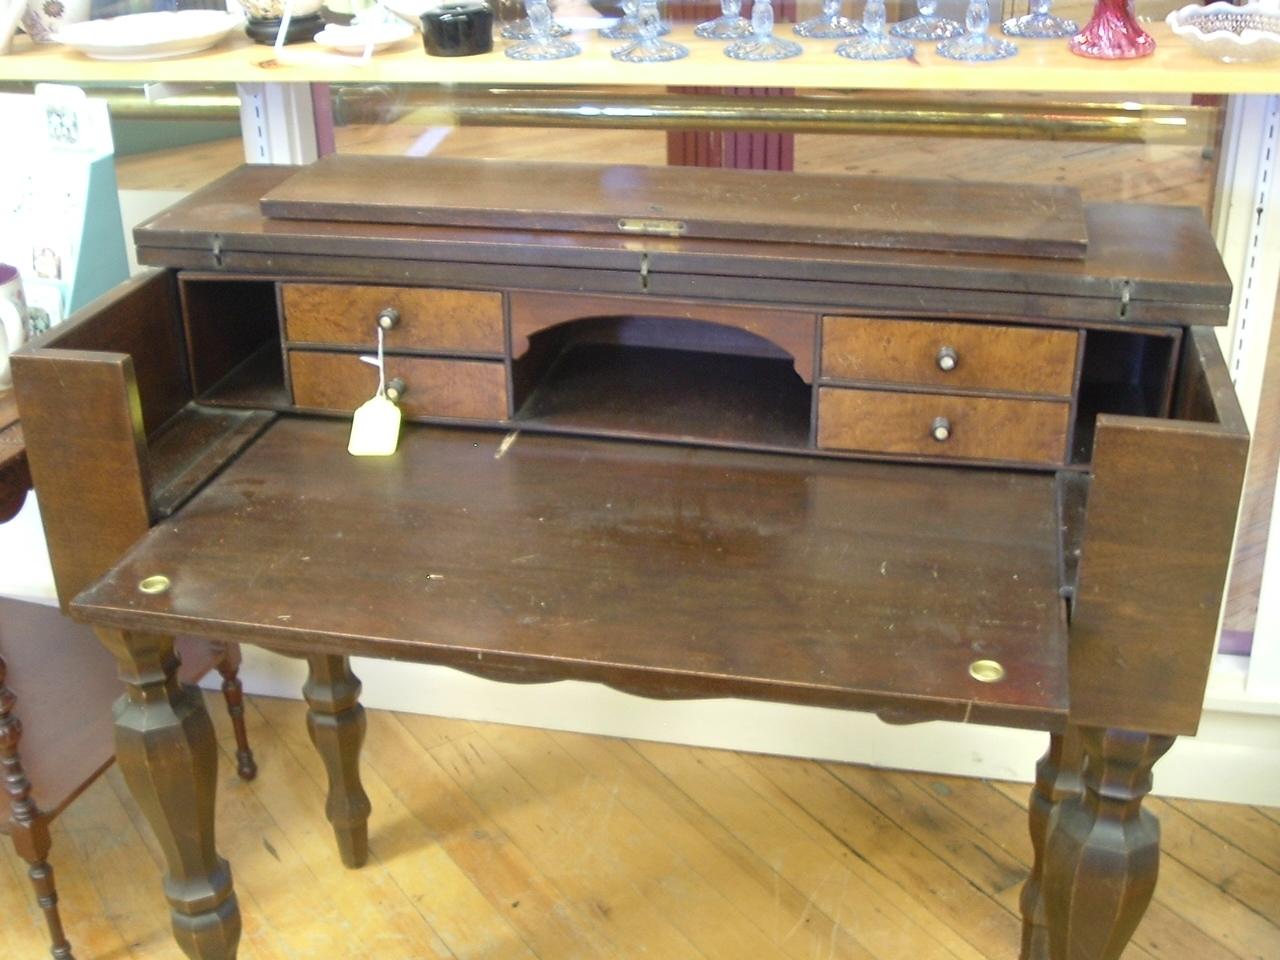 Antique Mahogany Spinet Desk - Spinet Desk - Lookup BeforeBuying - Antique  Spinet Desk Antique Furniture - Antique Spinet Desk Antique Furniture